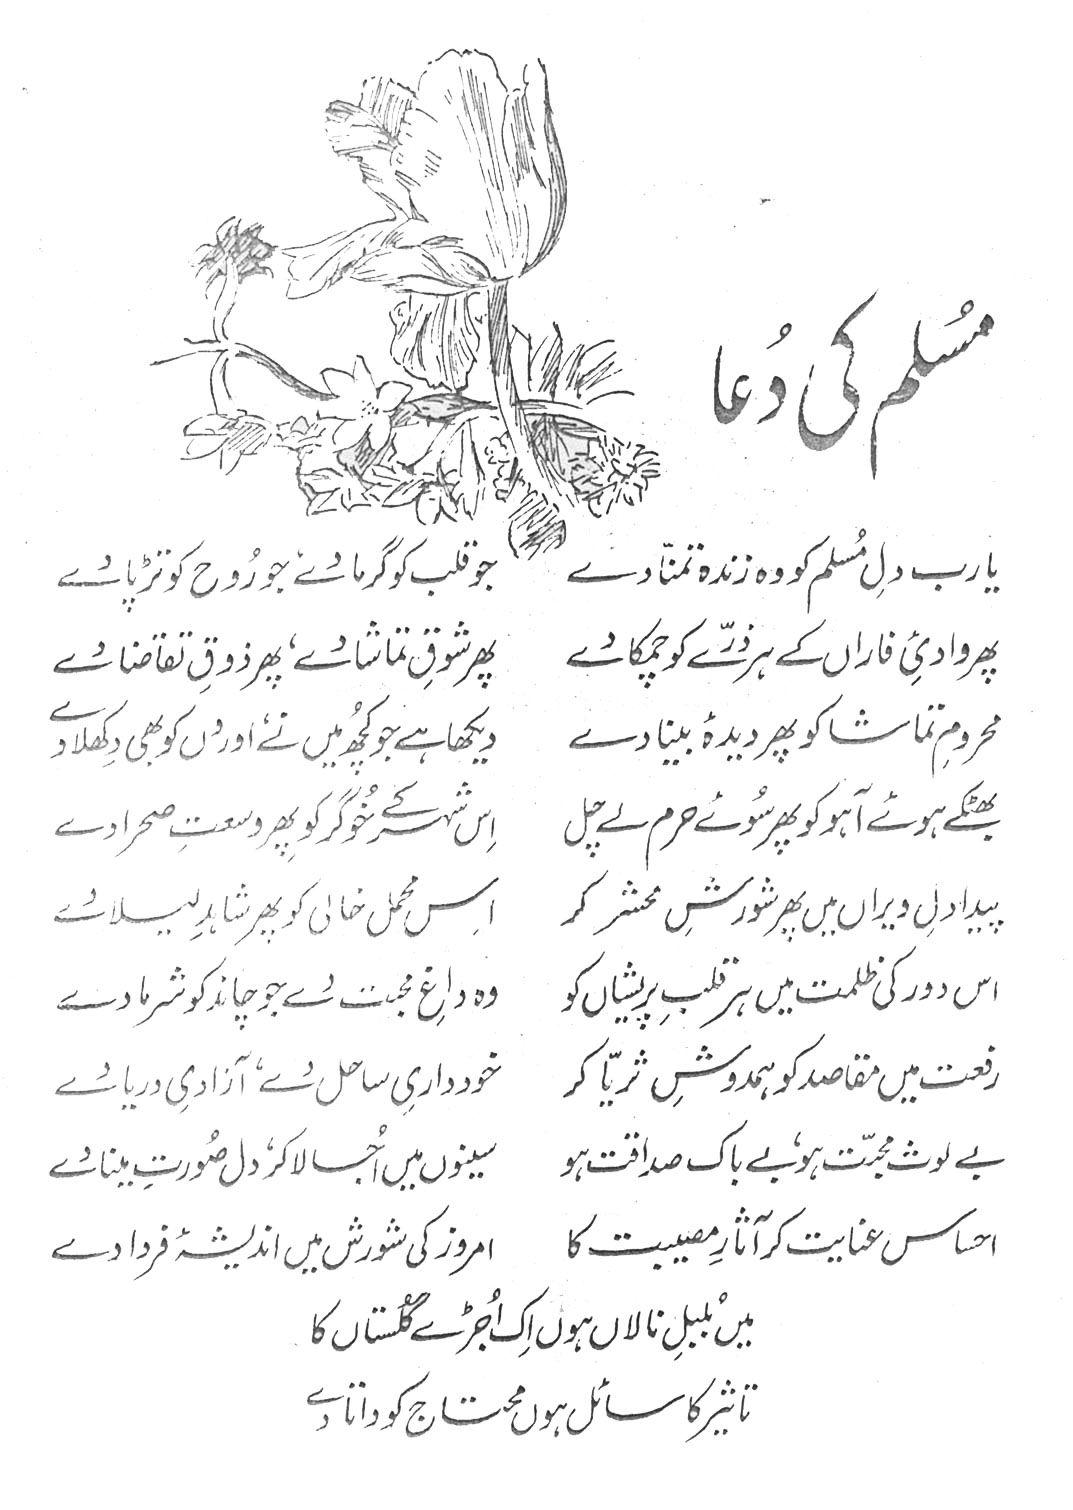 Iqbal As A Poet Poet, Sample resume, Allama iqbal